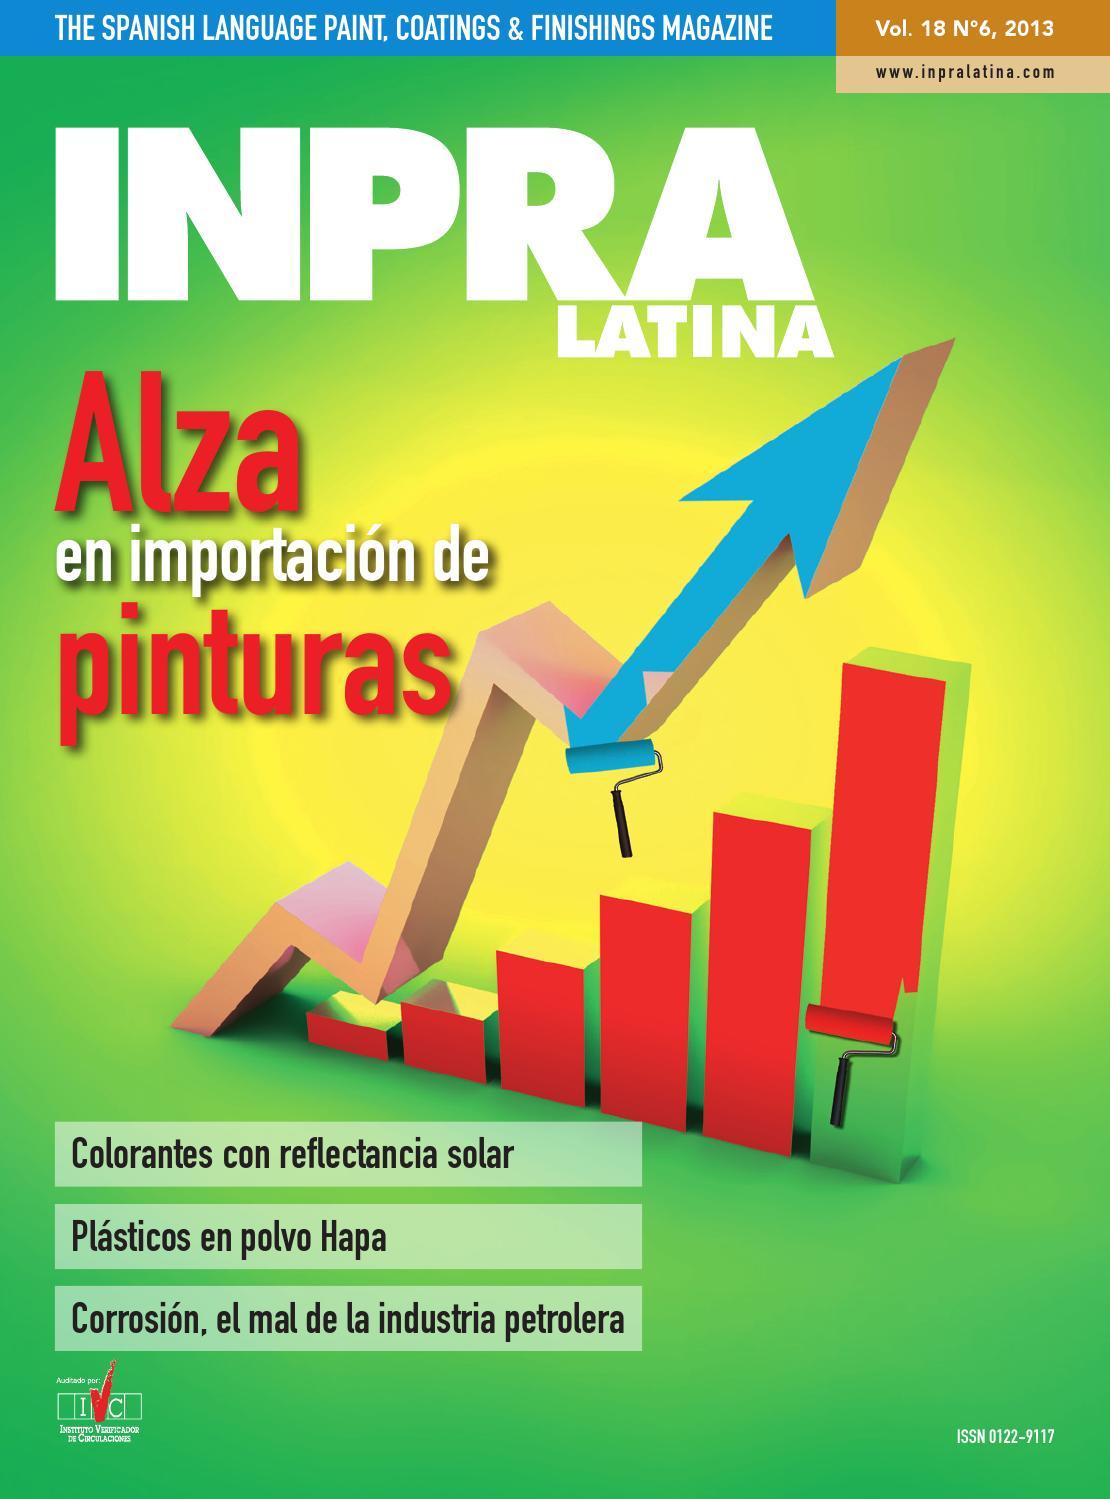 INPRA LATINA 18-6 by Latin Press, Inc. - issuu